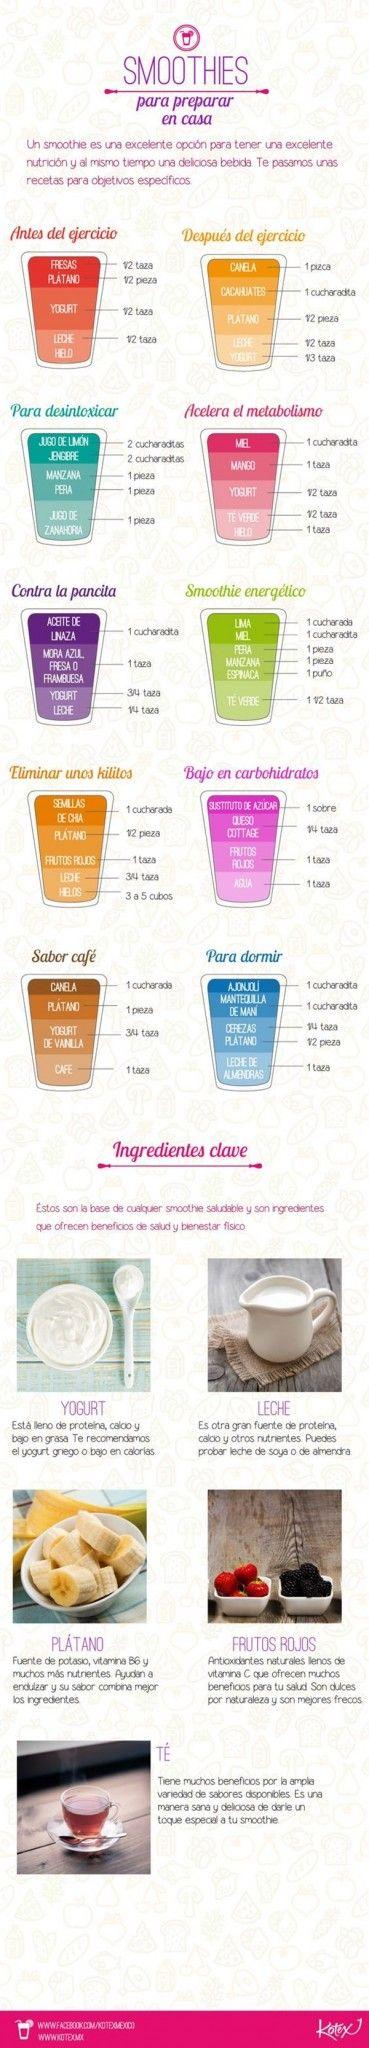 como preparar smoothies en casa